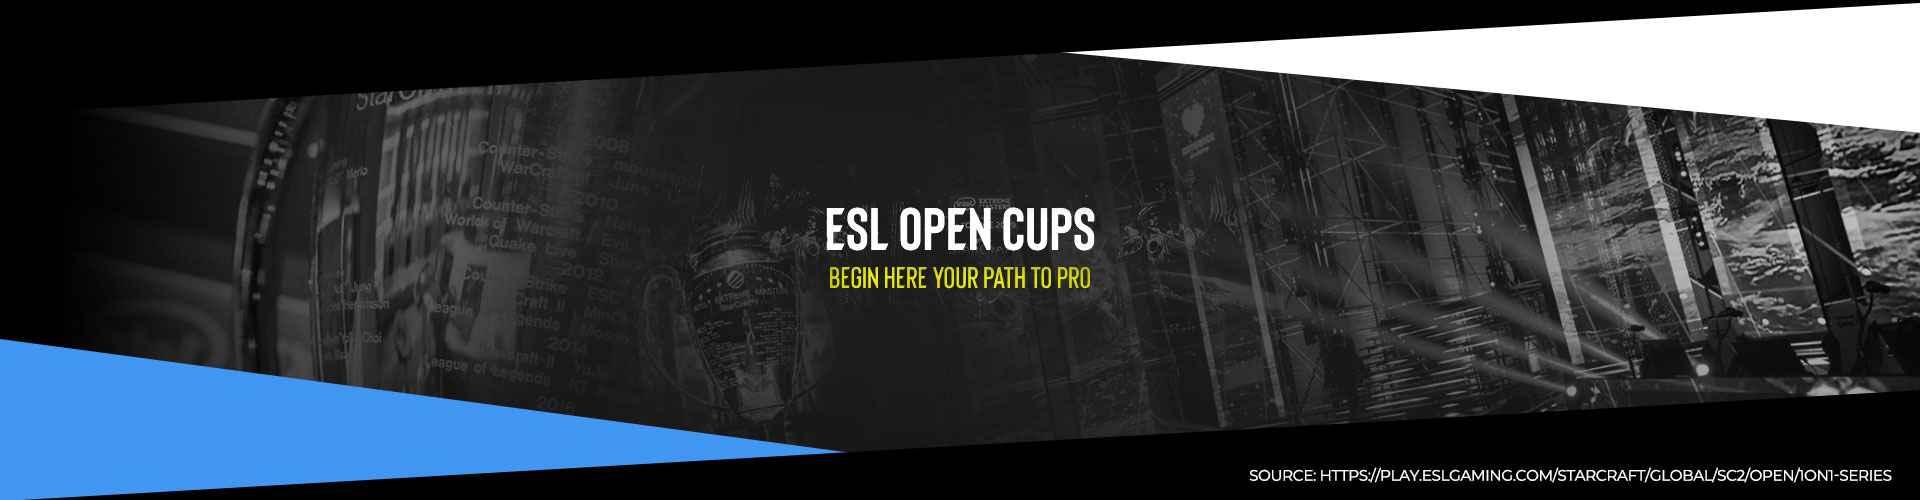 Starcraft 2 - ESL Open Cup 2020